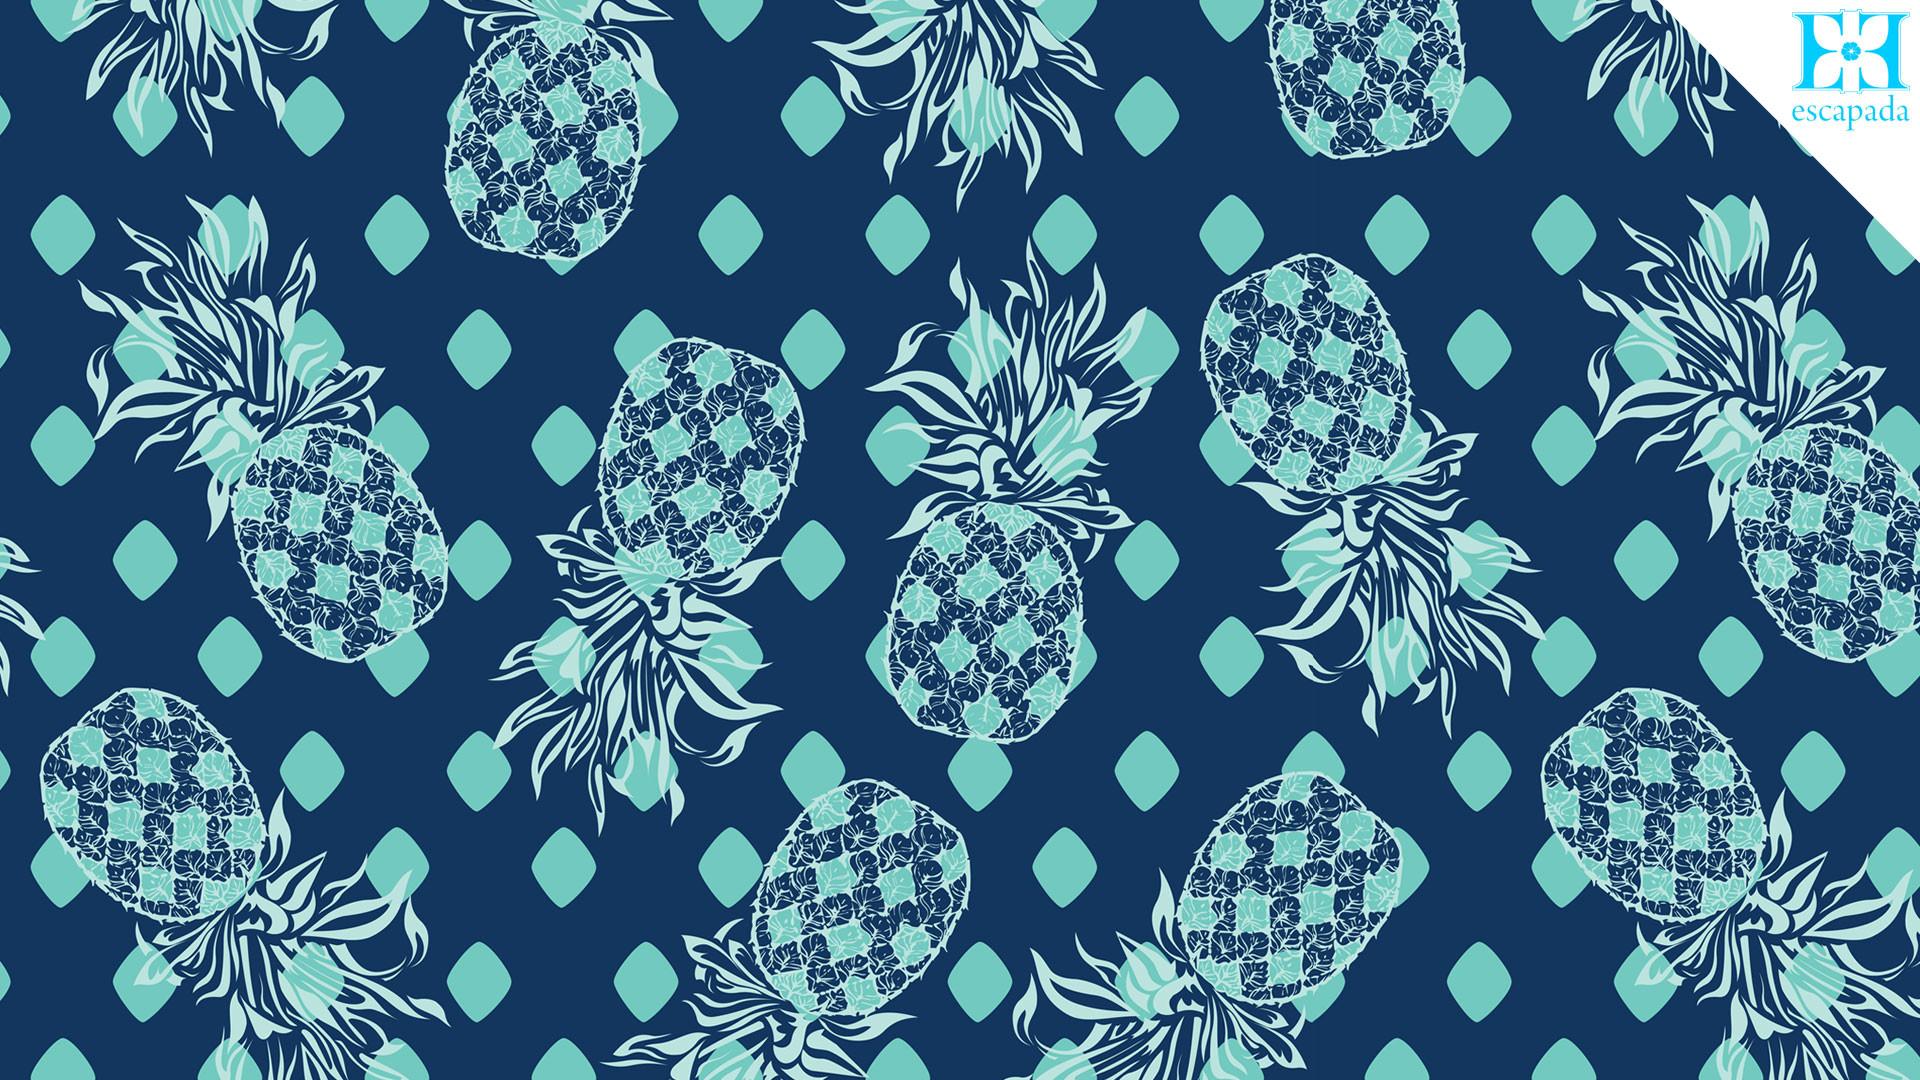 preppy wallpaper backgrounds – photo #7. DownloadTheses · preppy wallpaper  …